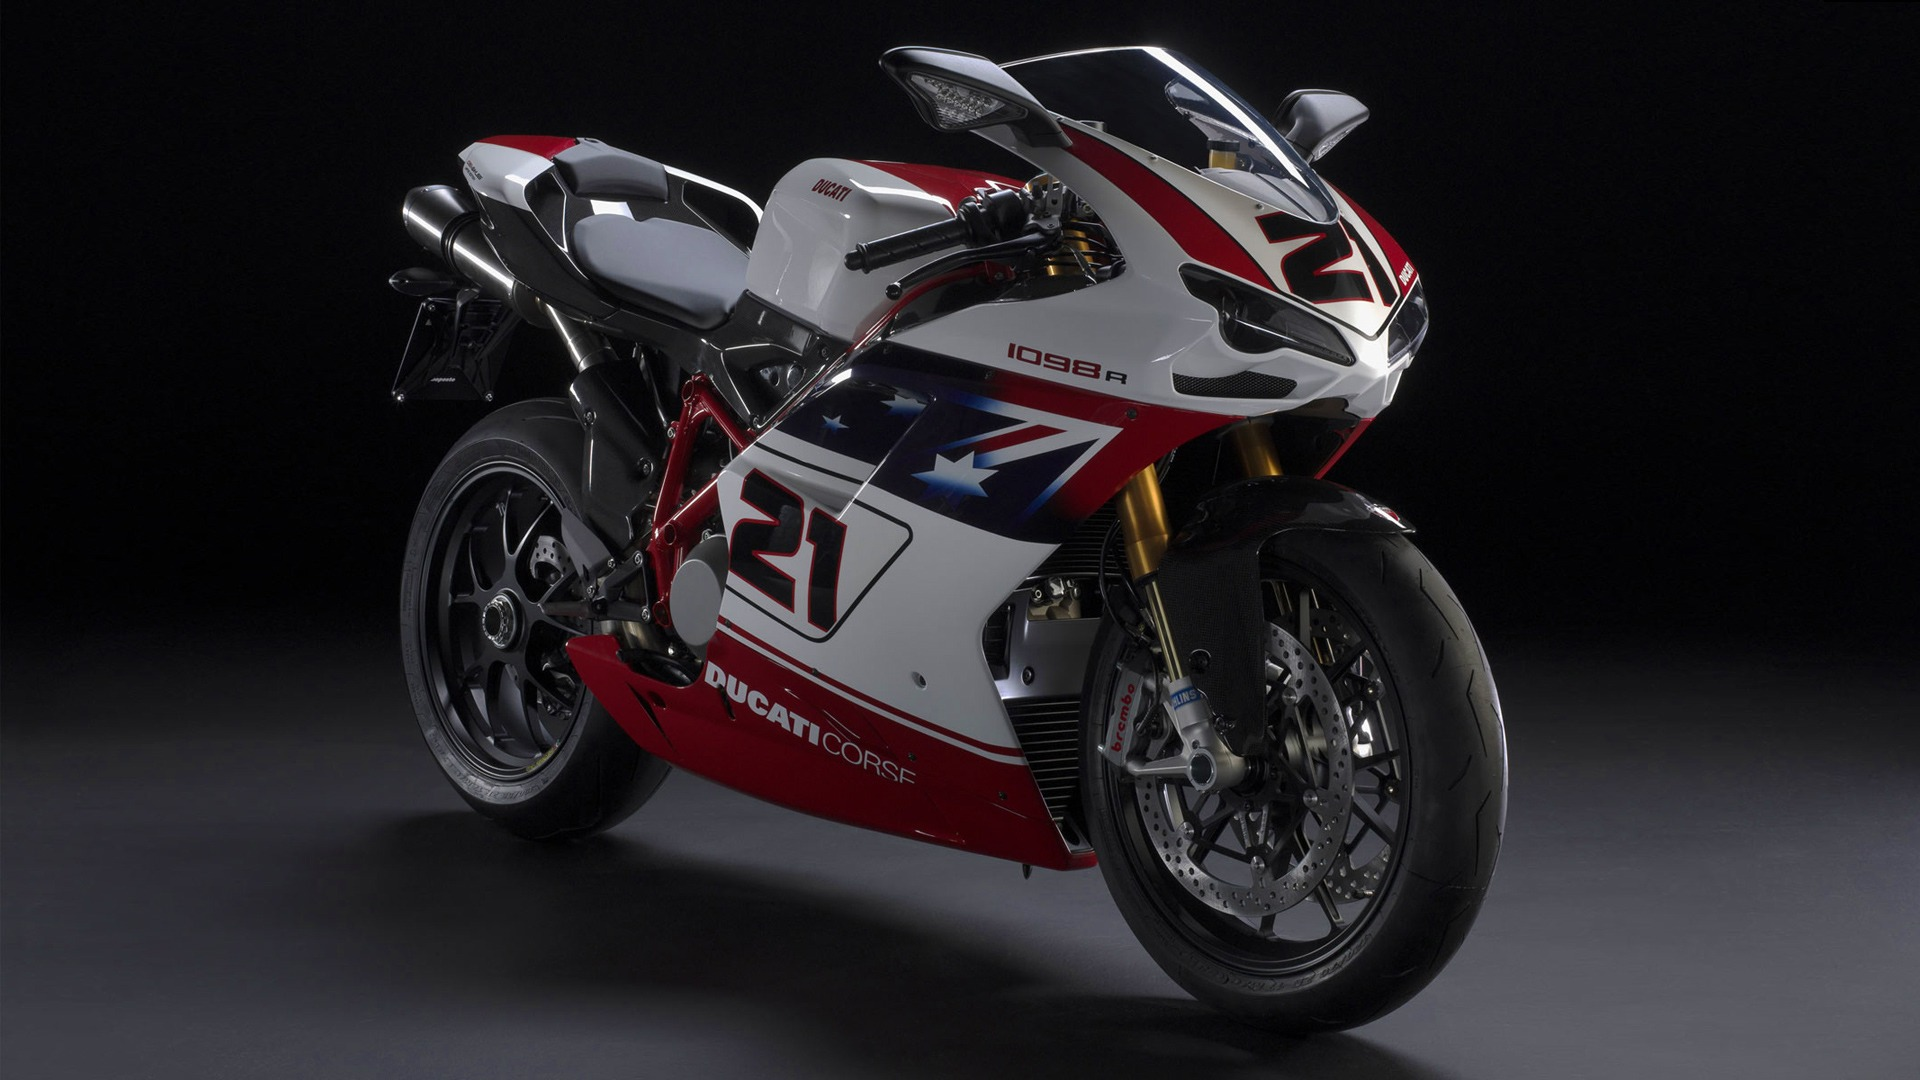 Ducati 1098 Hd Wallpaper